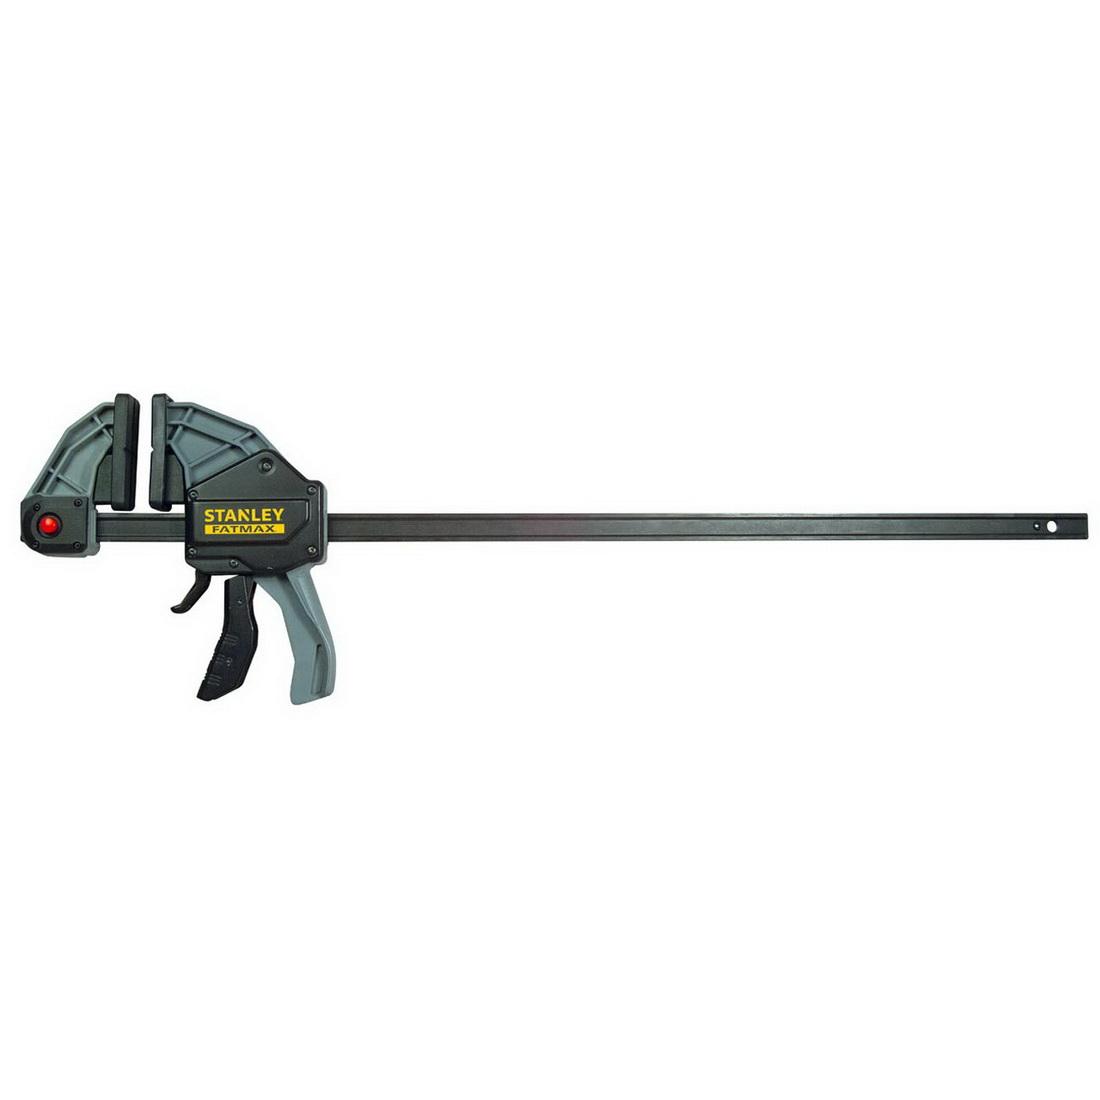 Fatmax XL 150mm x 92mm Trigger Bar Clamp